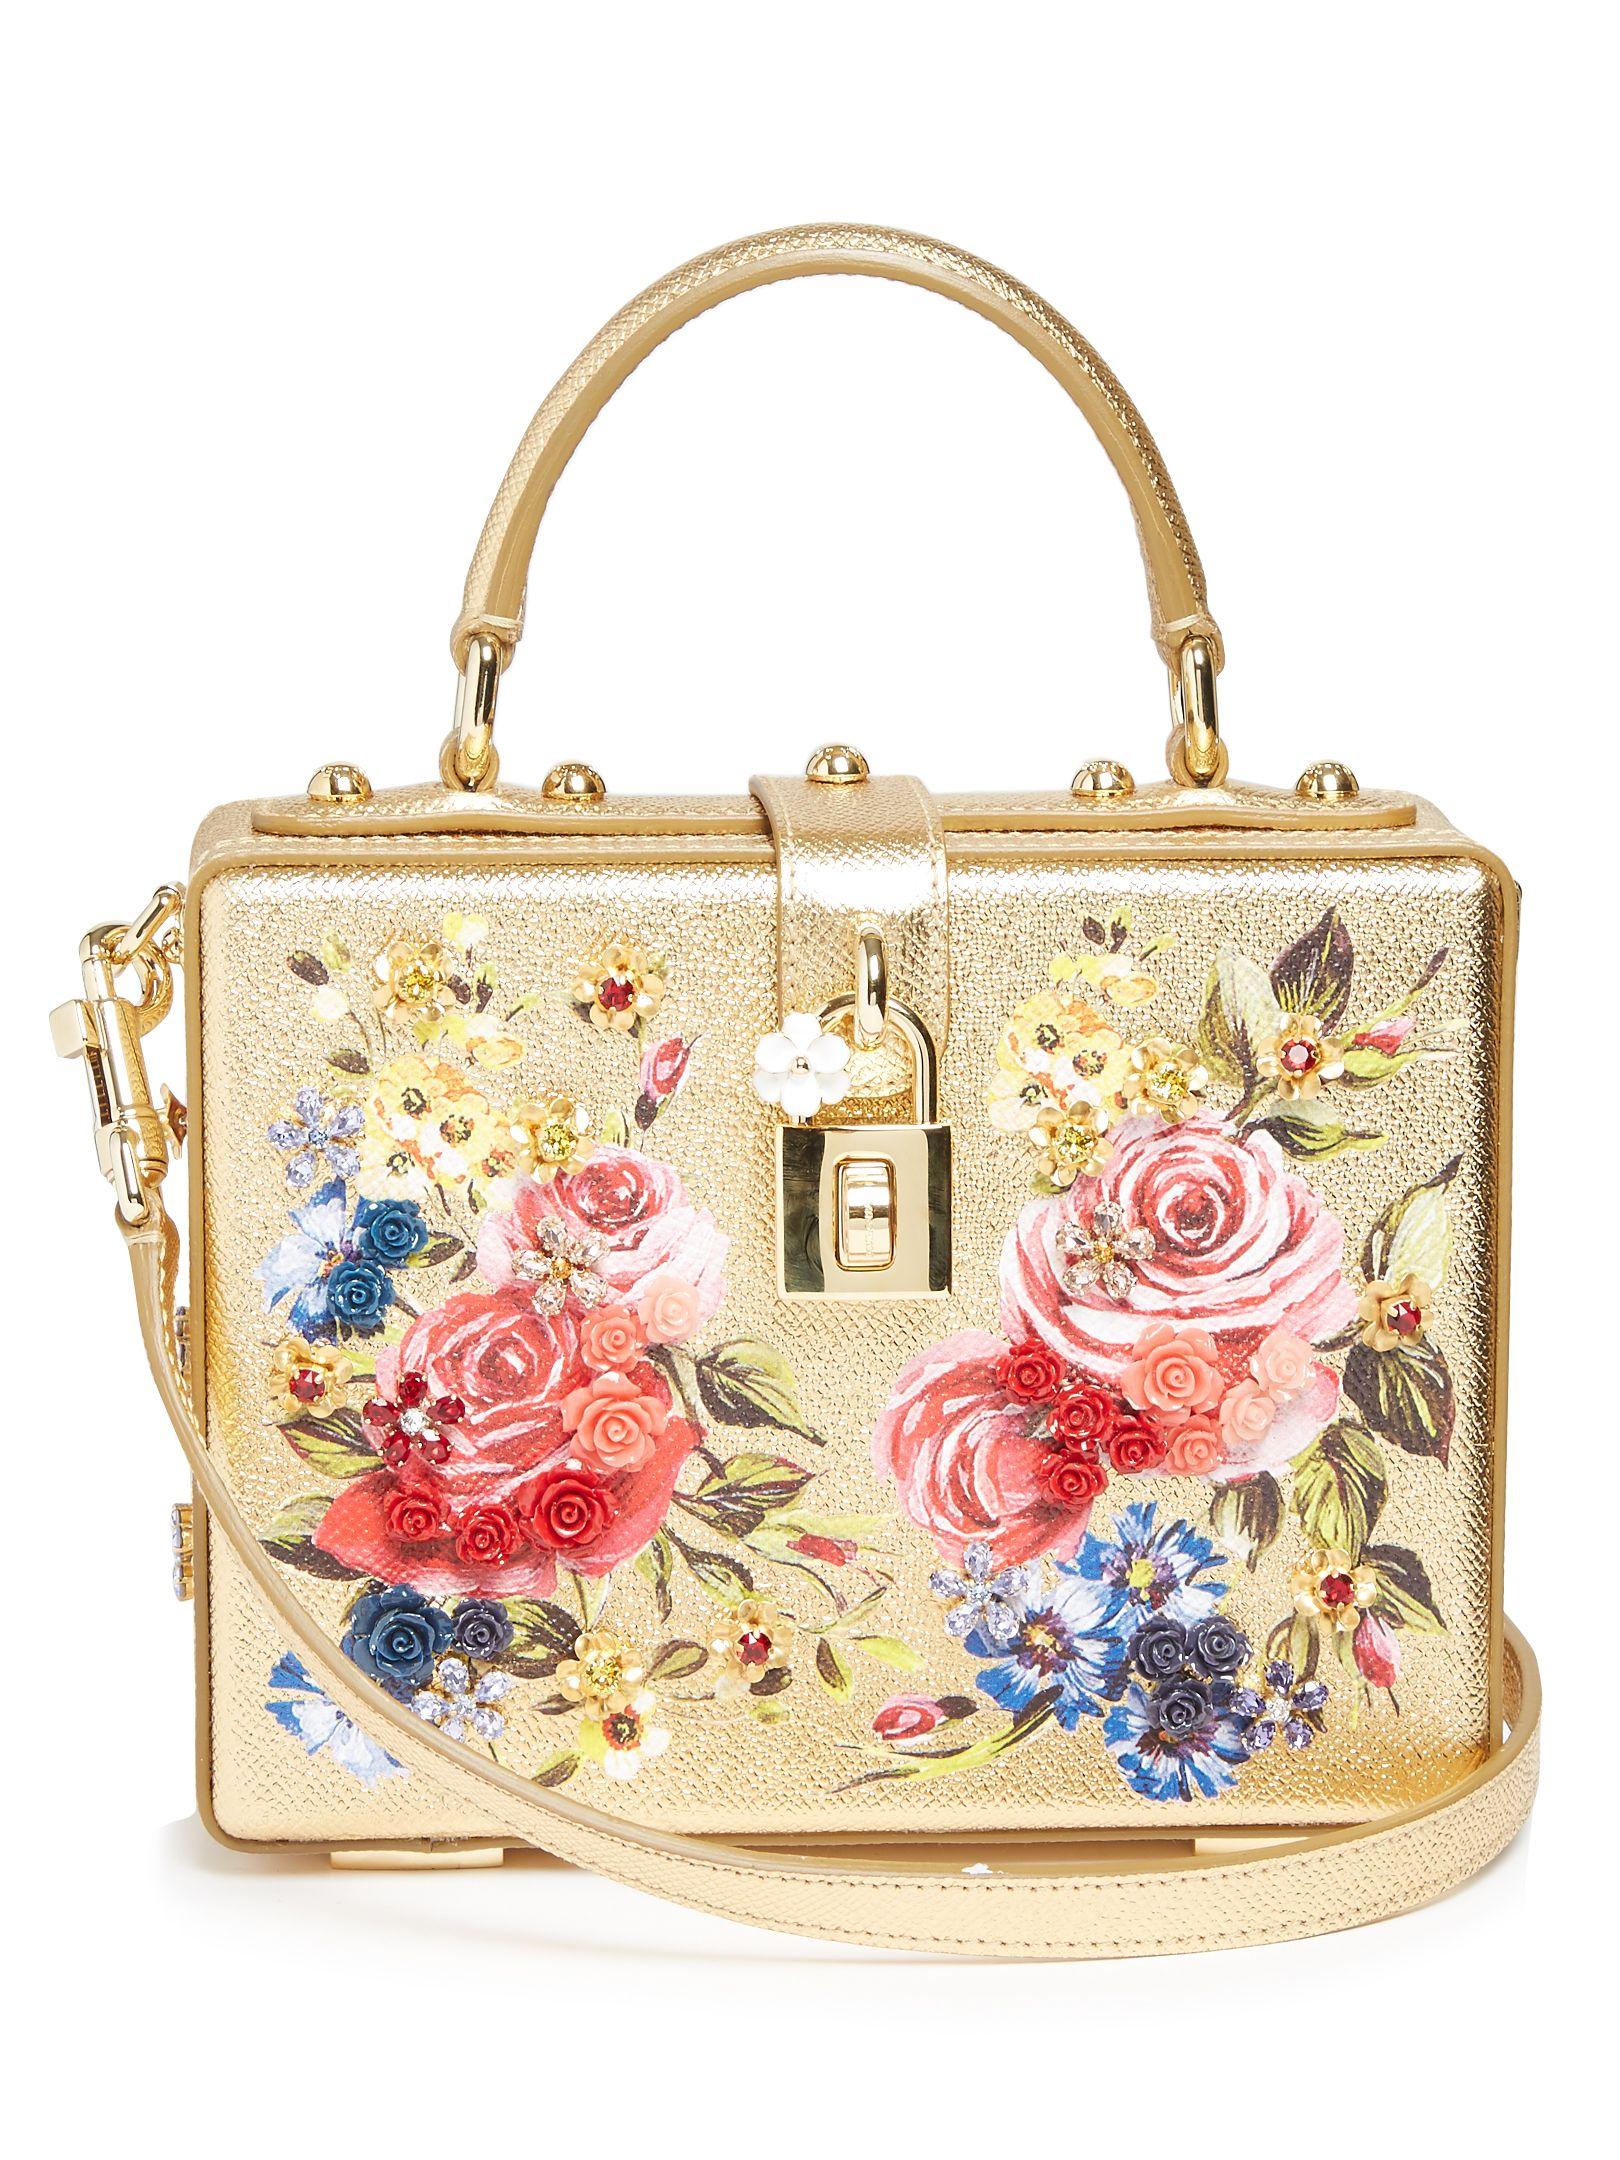 2faef5cf8f7 Dolce Soft rose-print leather box bag   Dolce & Gabbana   MATCHESFASHION.COM